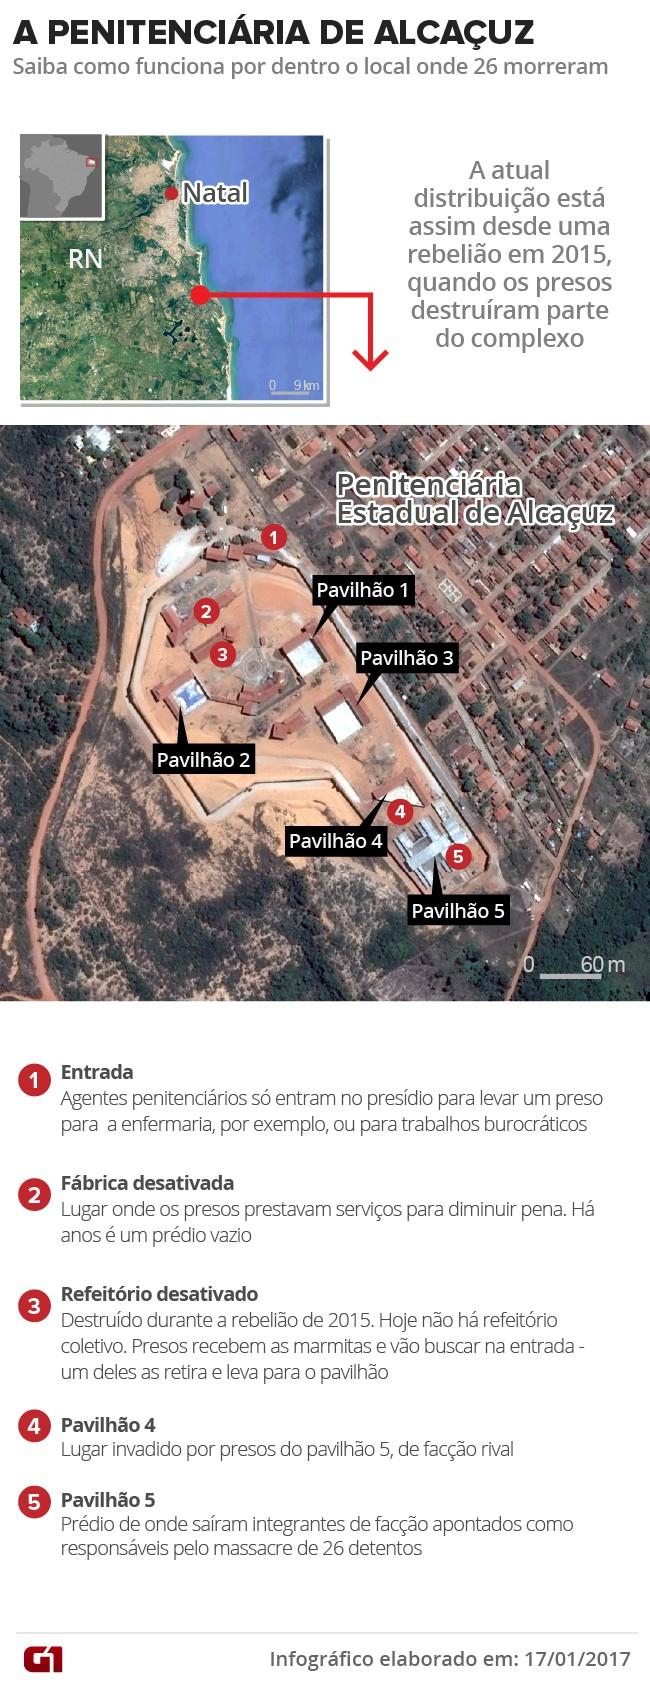 Penitenciária de Alcaçuz (Foto: Arte/G1)